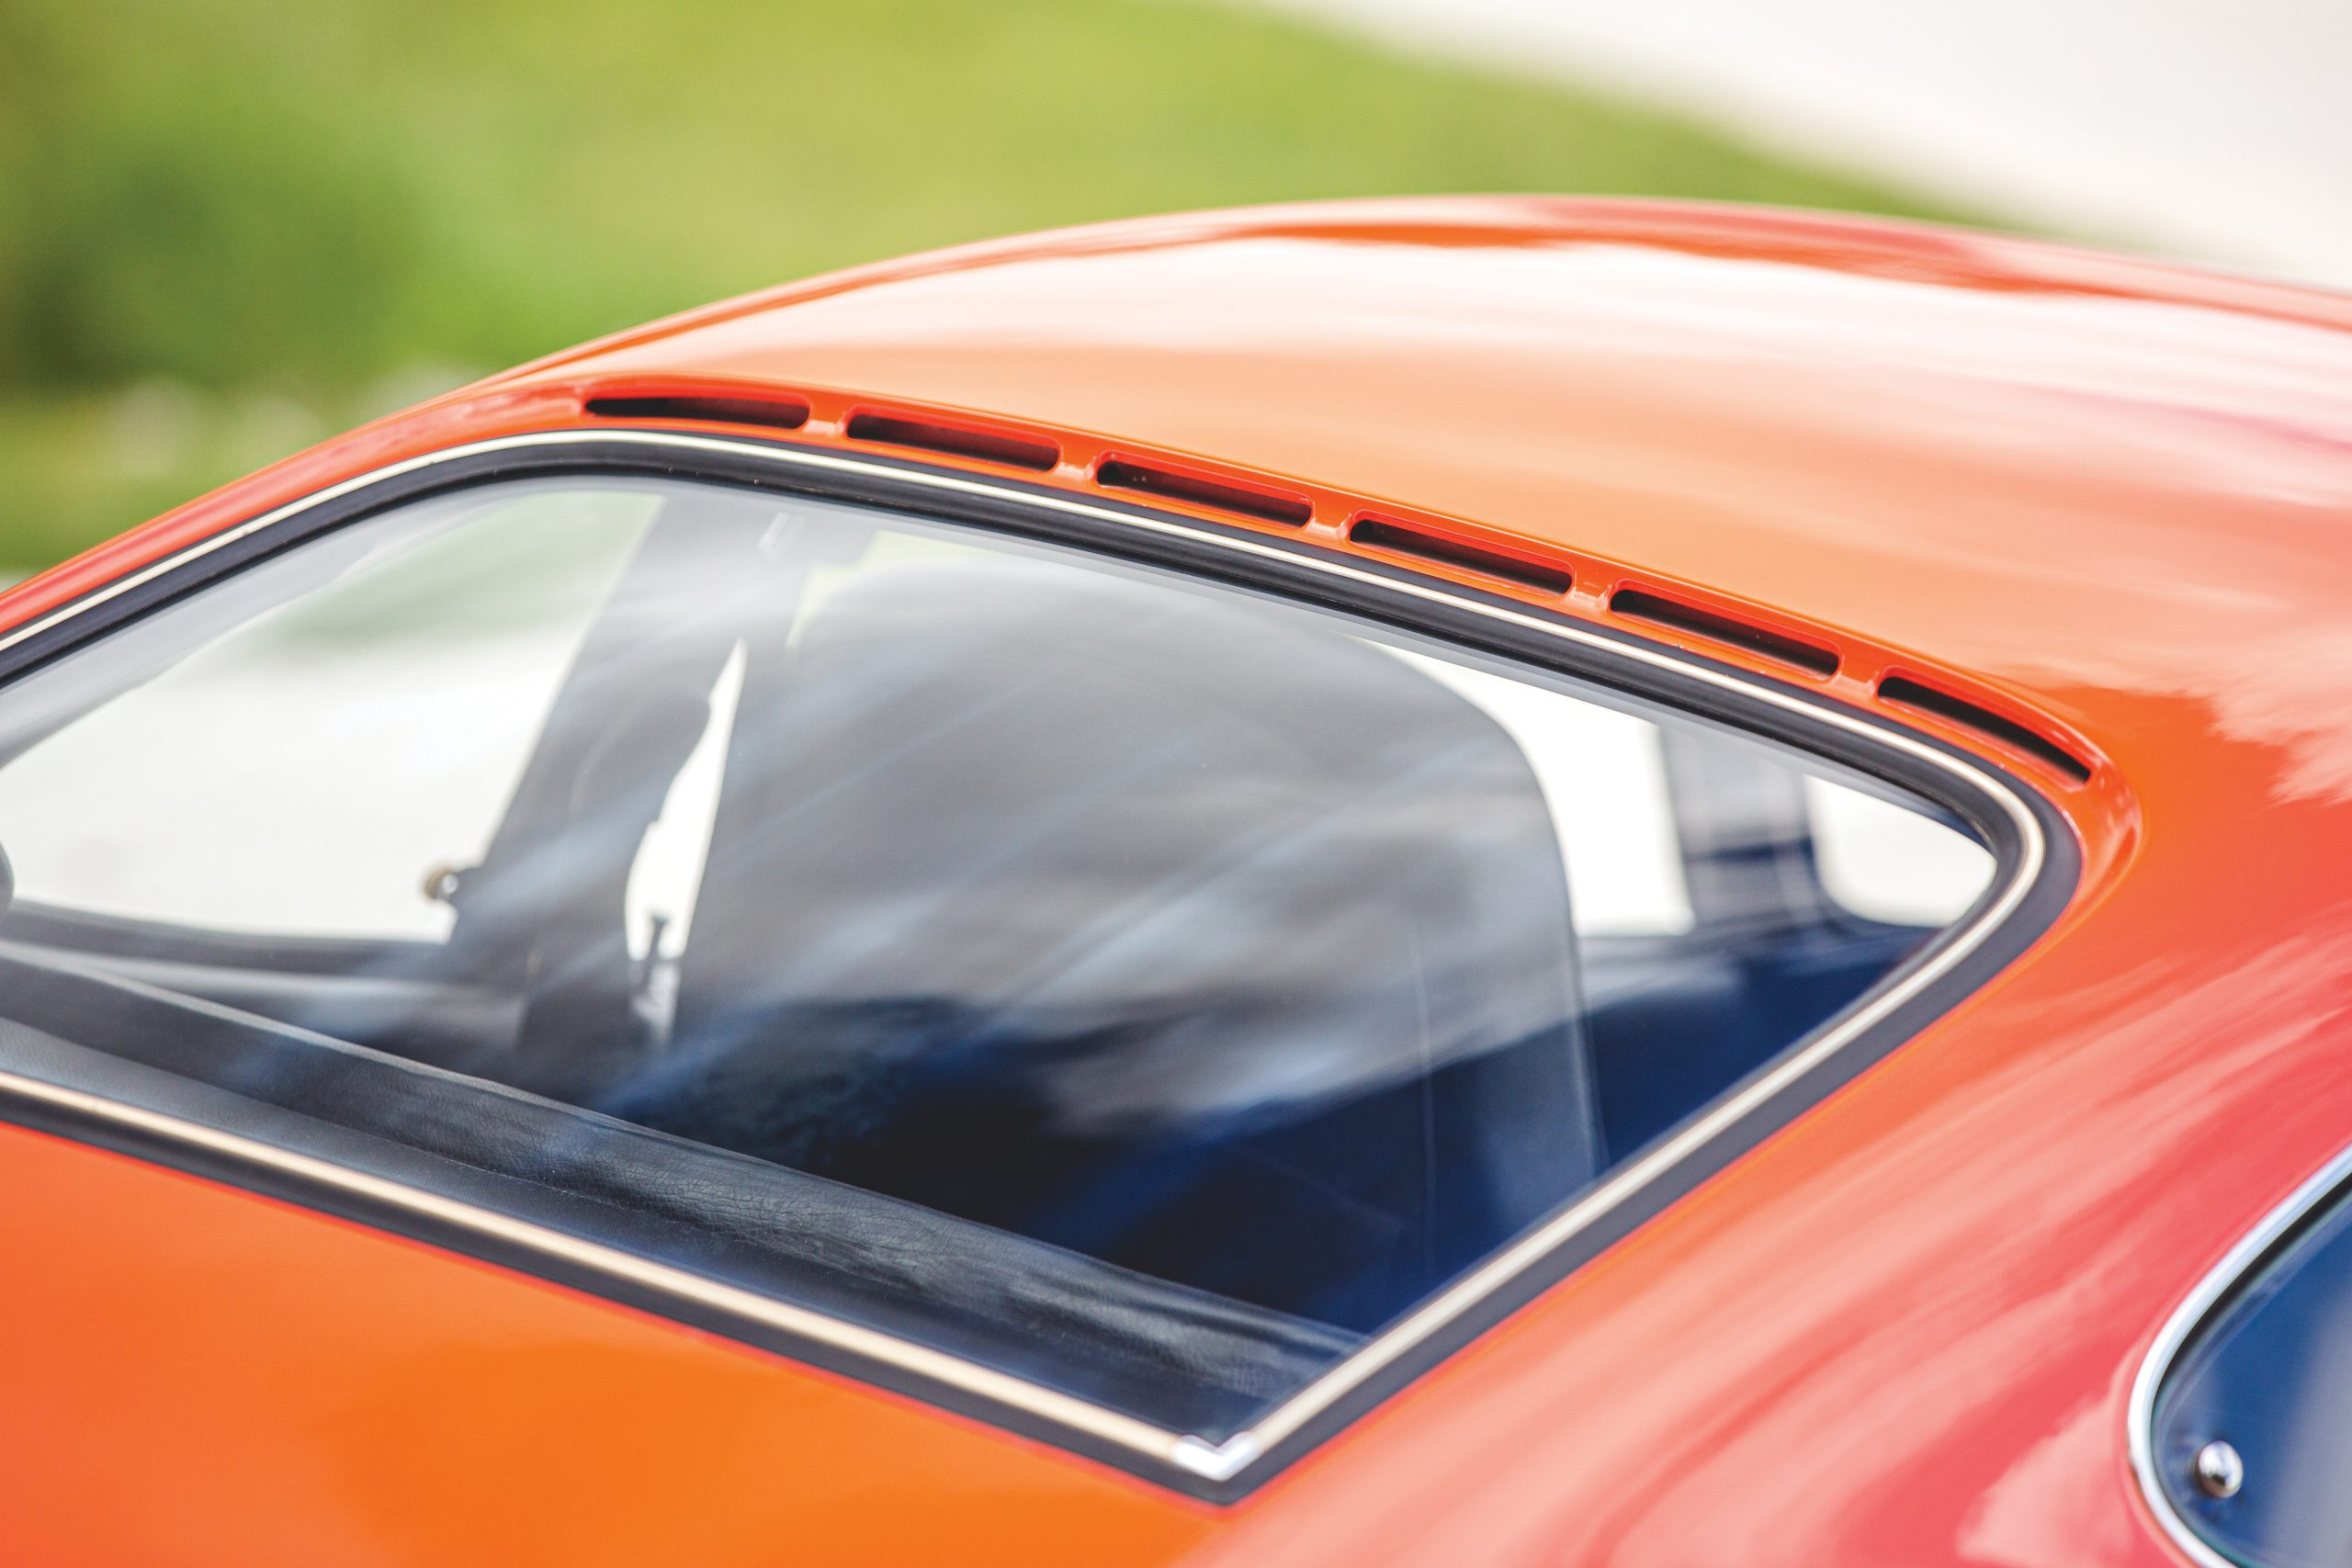 1973 Opel GT roof vent windows